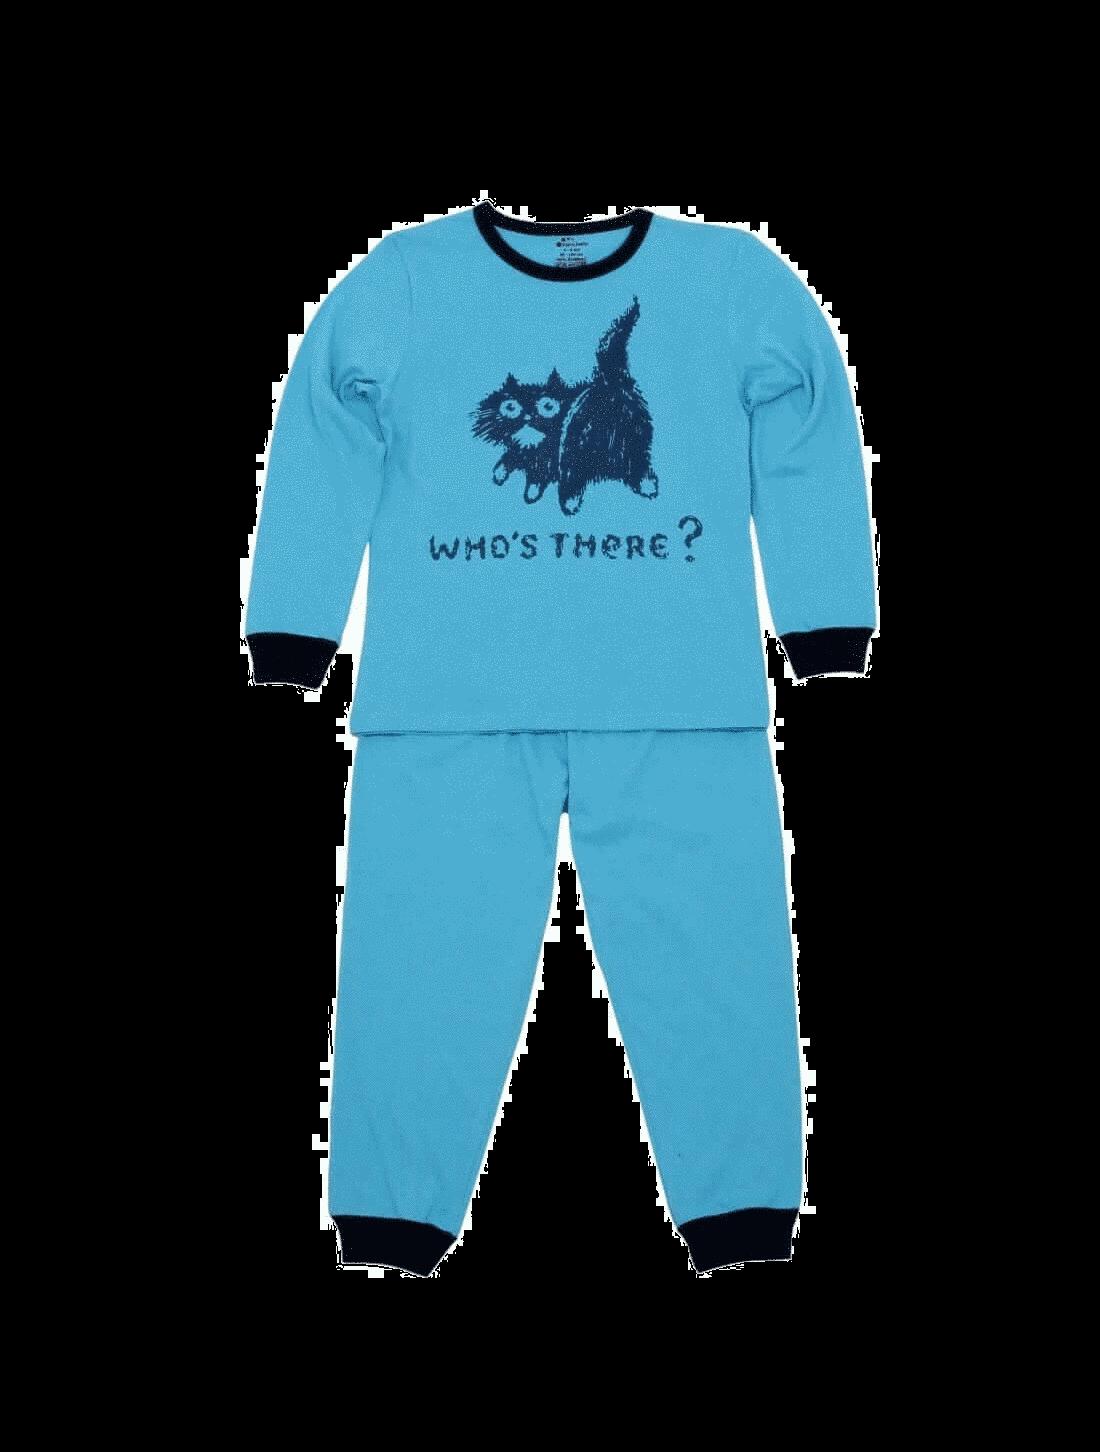 Pijama copii cu maneca lunga, turqois, who's there ?